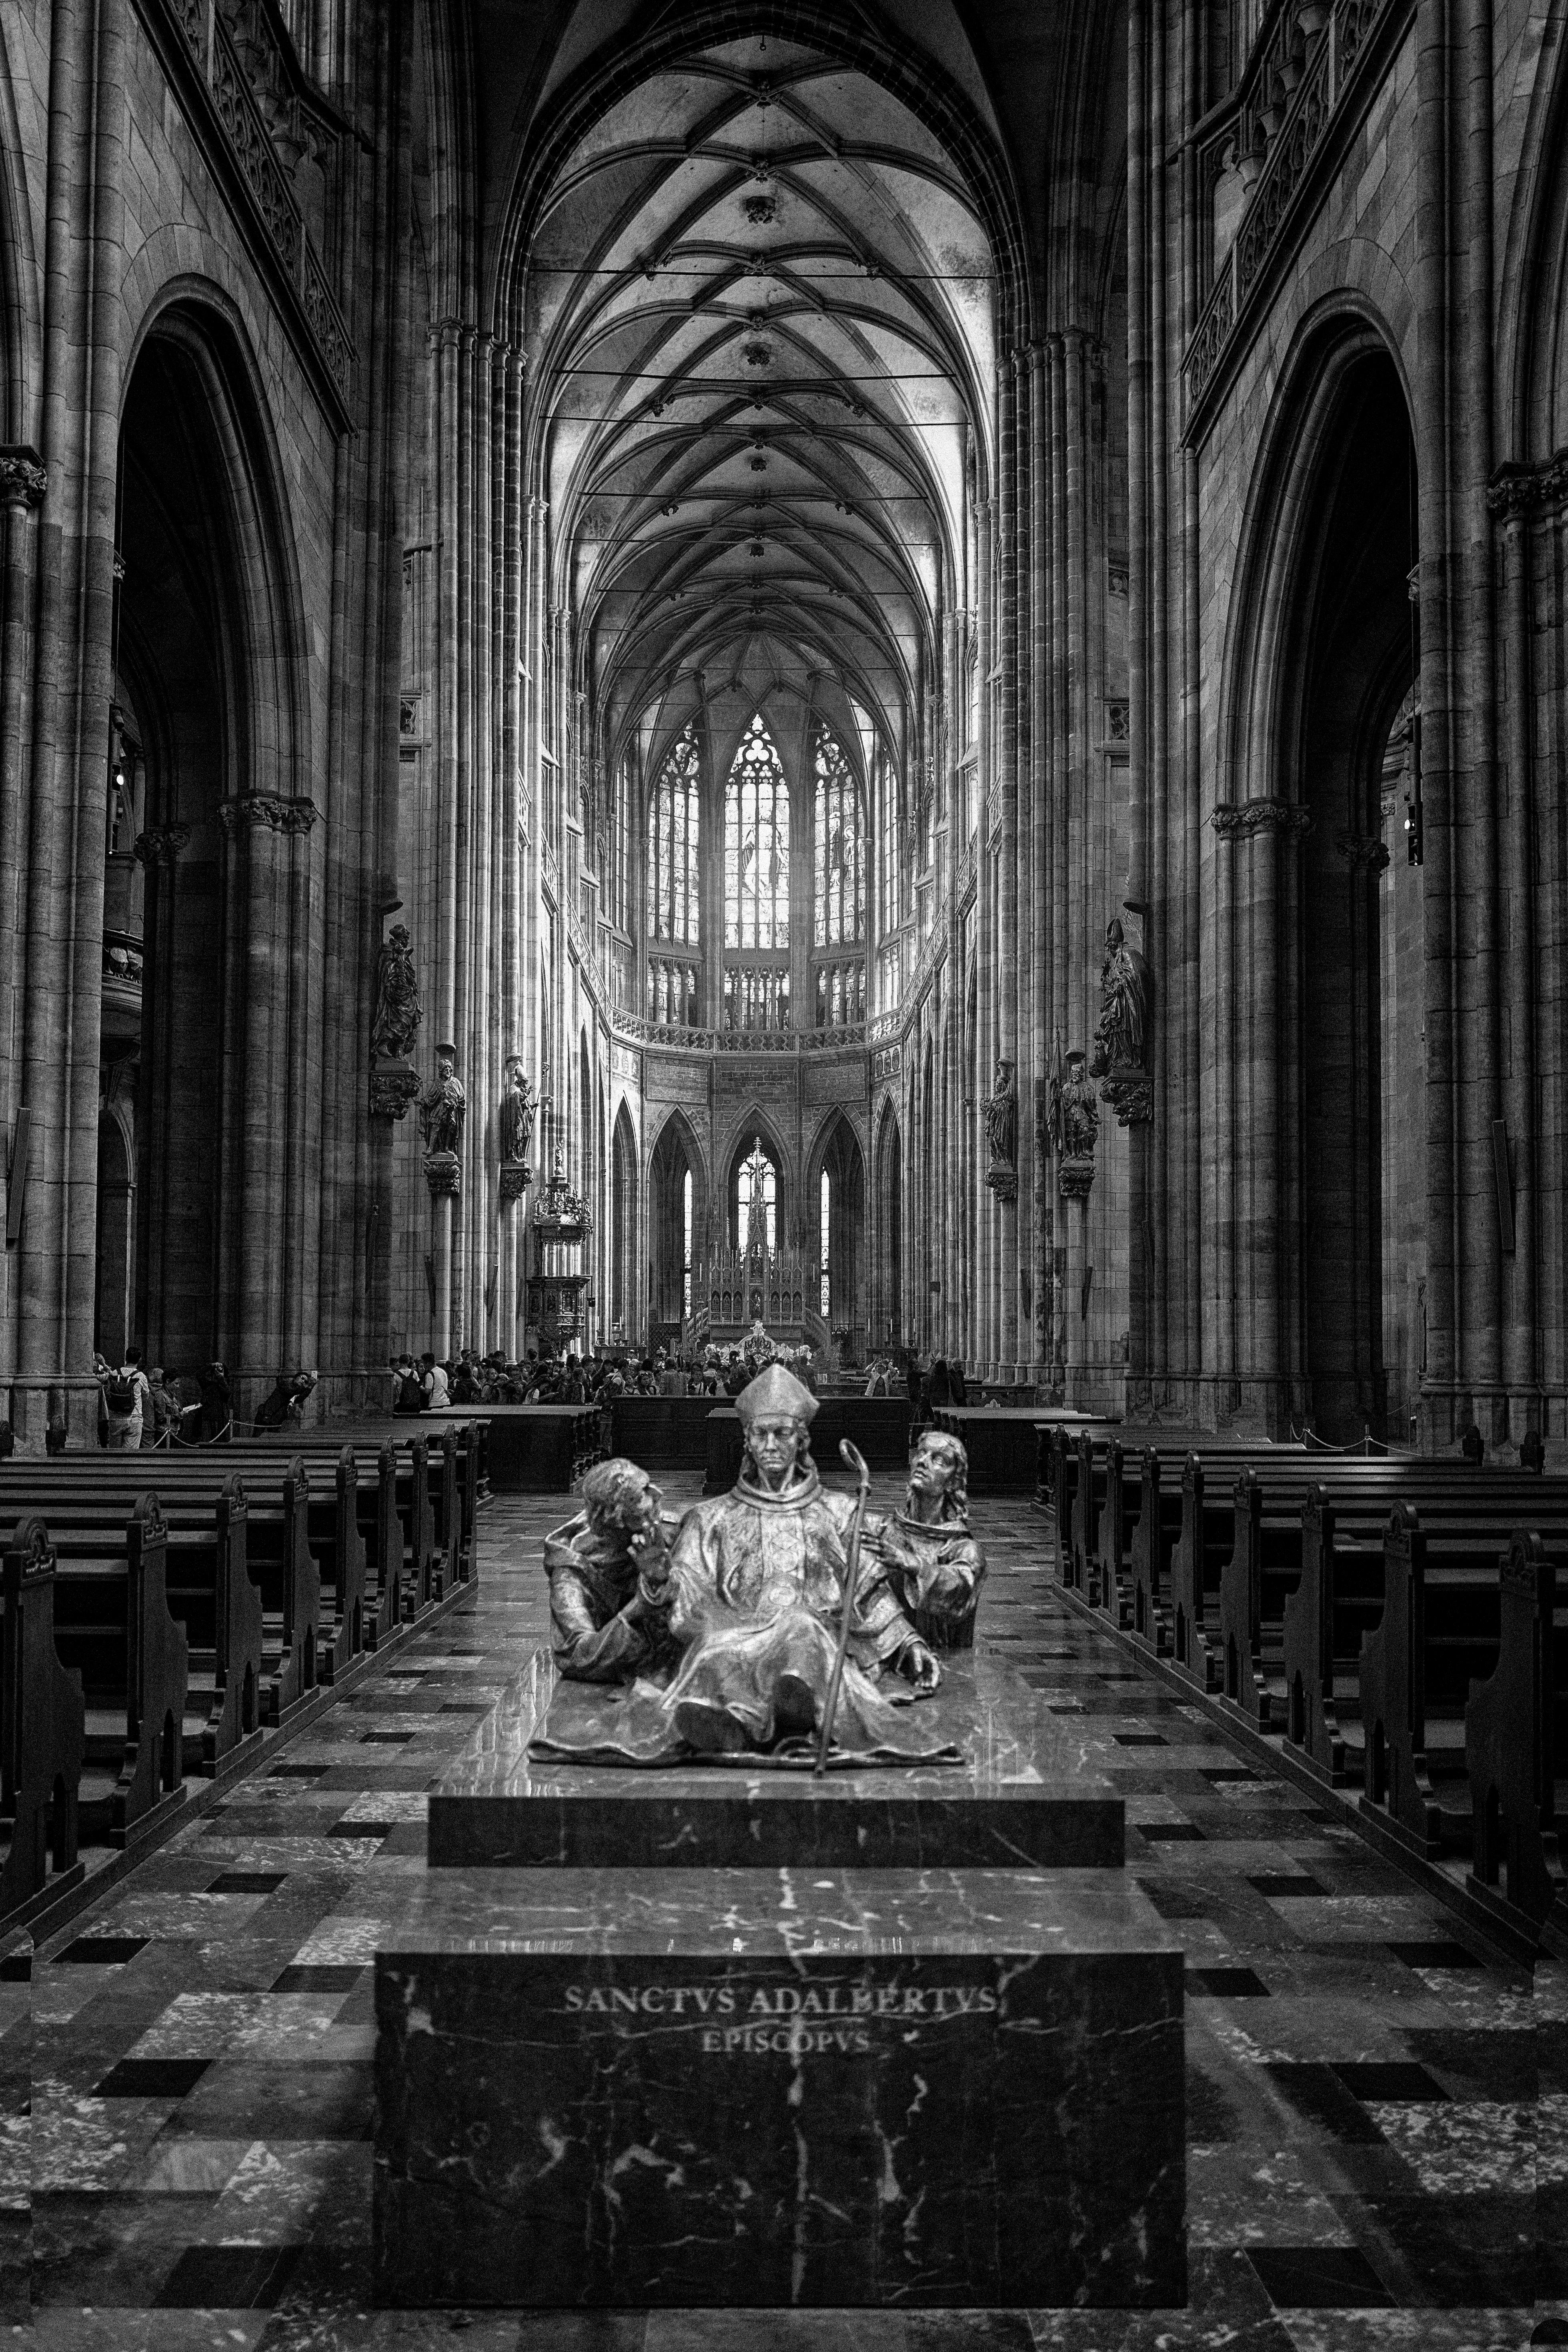 """Adalbertus"", Catedral de San Vito, Praga, República Checa. Abril 2018."